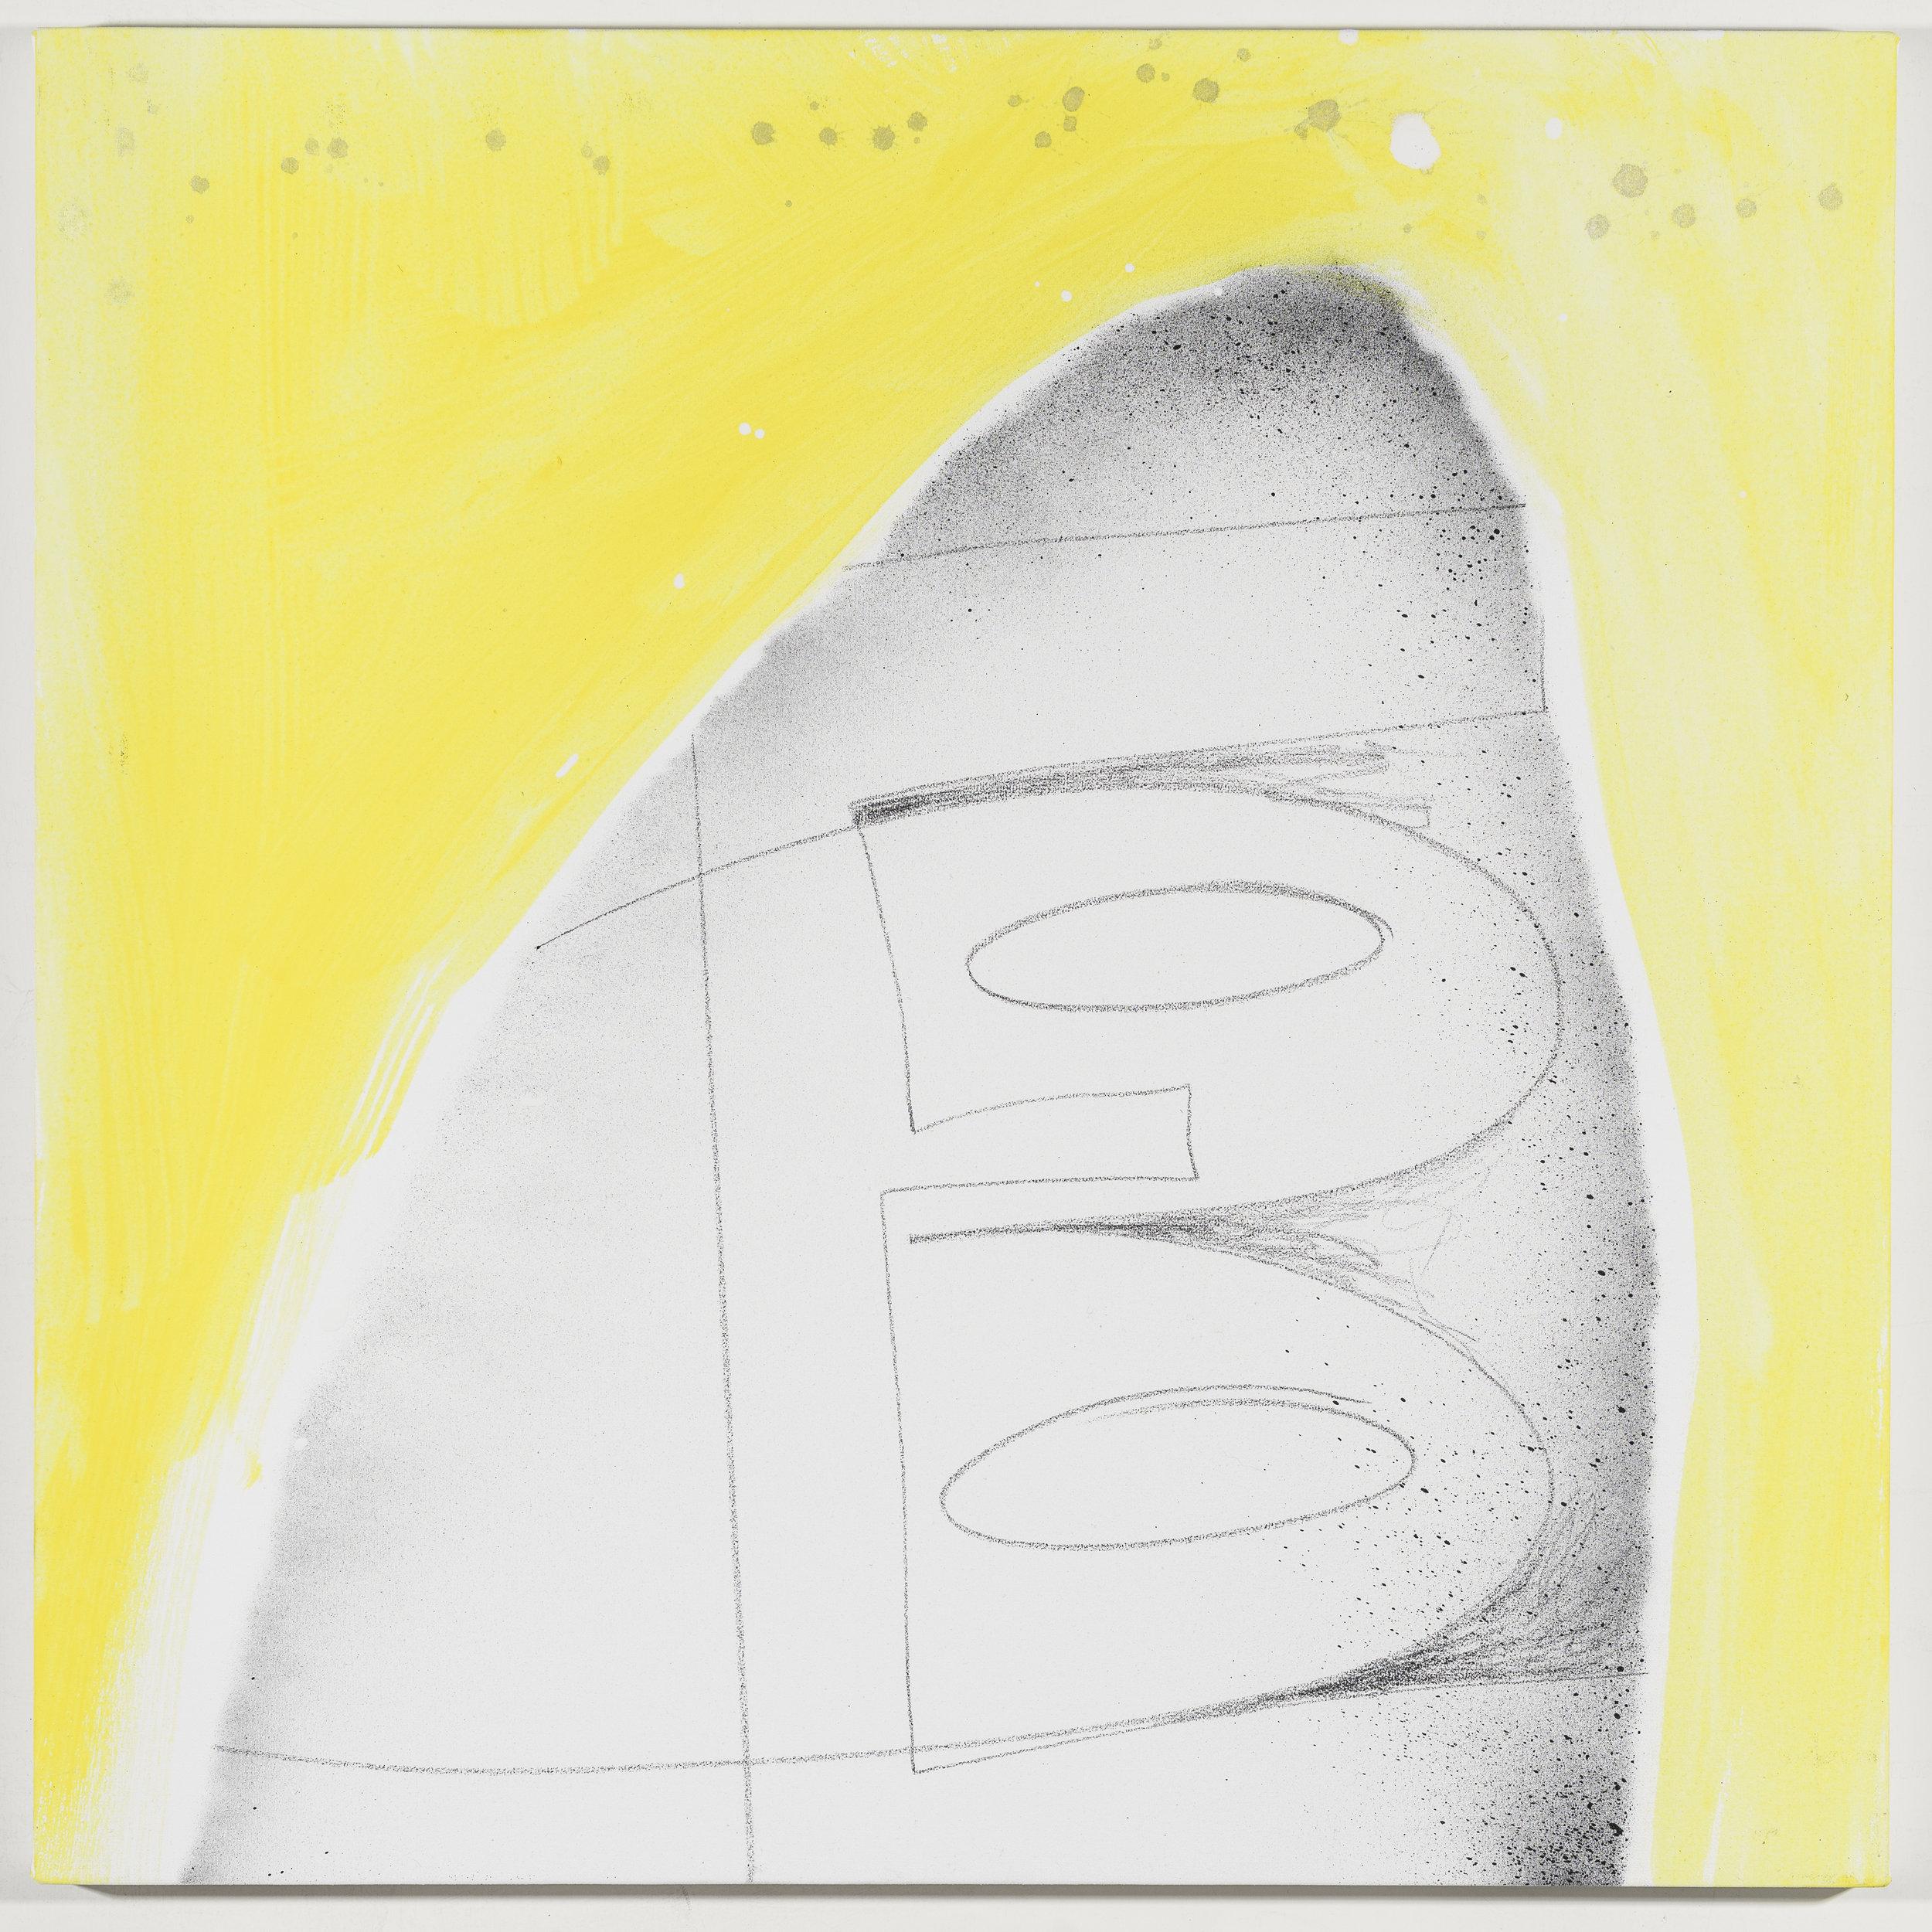 Initials: Bridget Everett   2018  Graphite and acrylic on canvas  20 x 20 inches; 51 x 51 cm